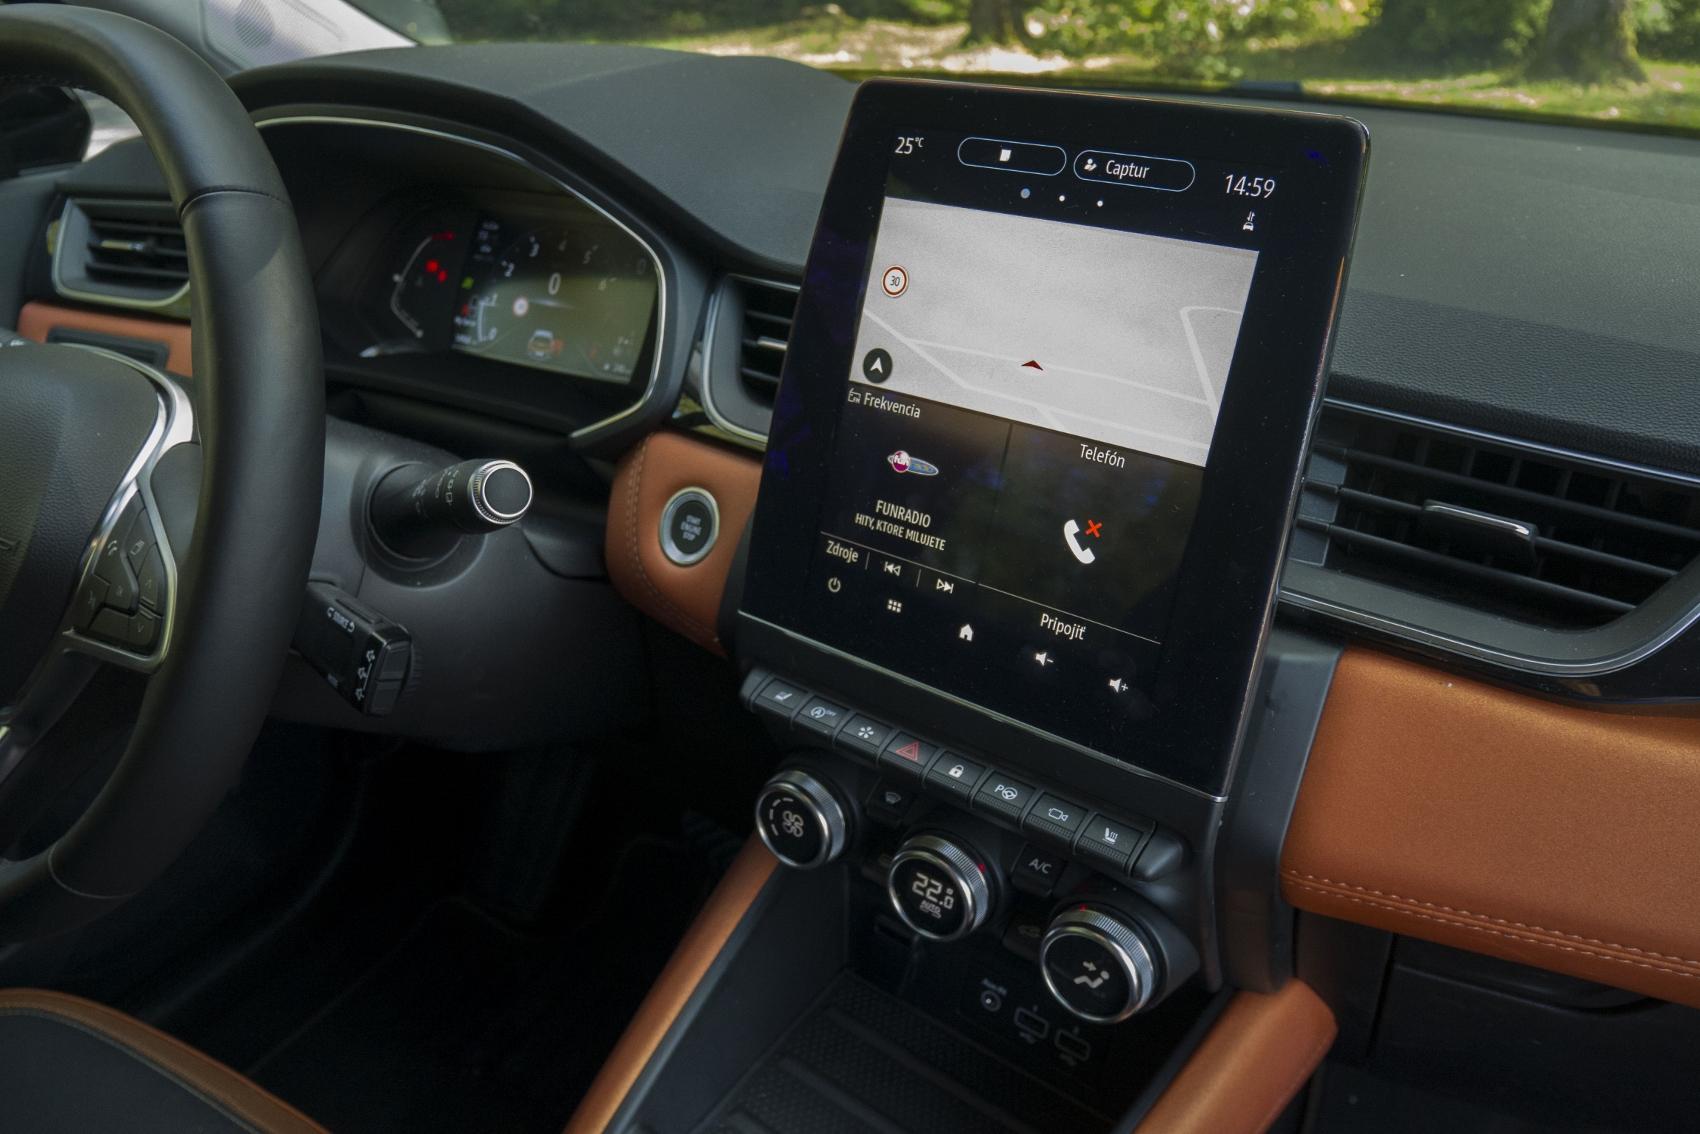 Test: V interiéri sa Renault Captur tvári ako o triedu drahšie auto mT2aGz5Klu renault-captur-27